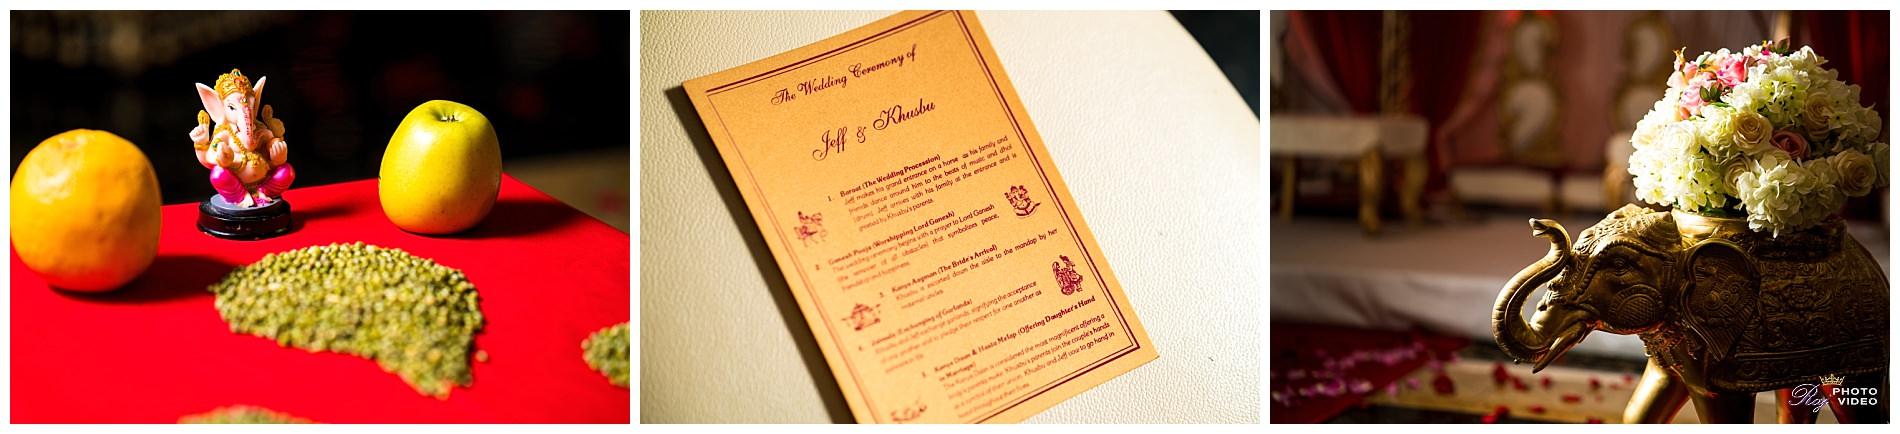 Aashirwad-Palace-Randolph-NJ-Hindu-Wedding-Ceremony-Khusbu-Jeff-3.jpg